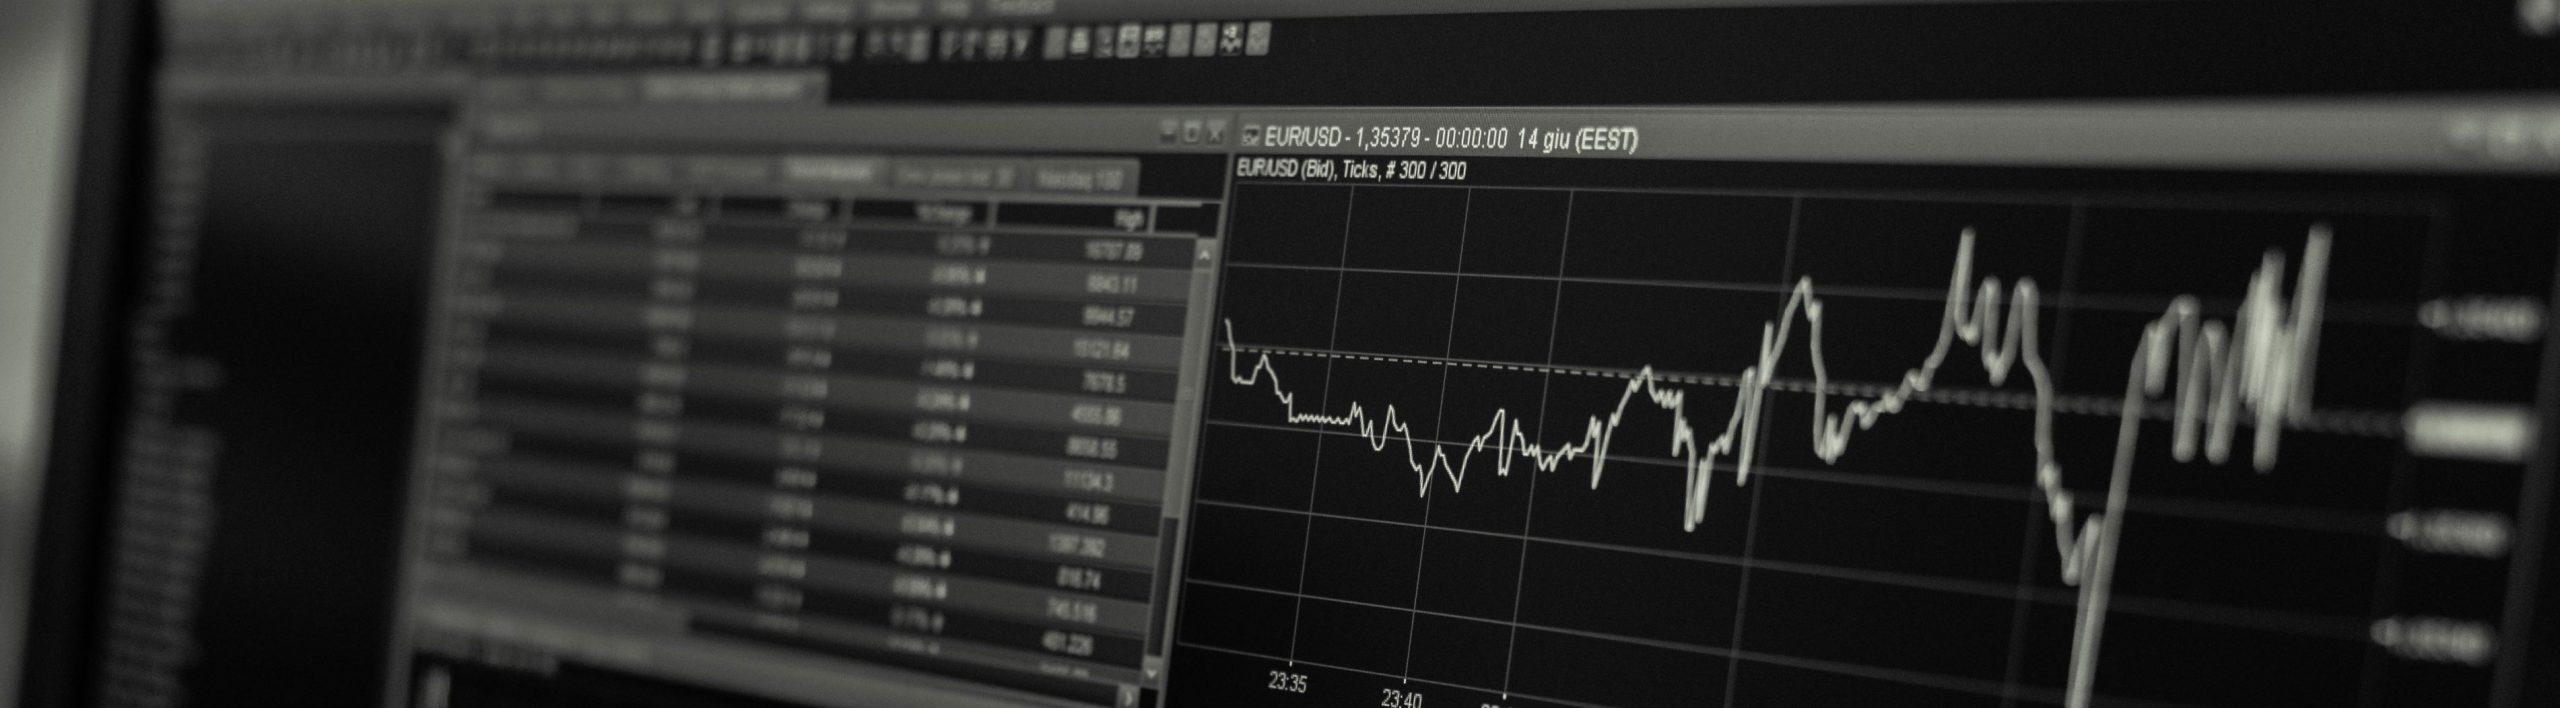 eurusd chart on a screen